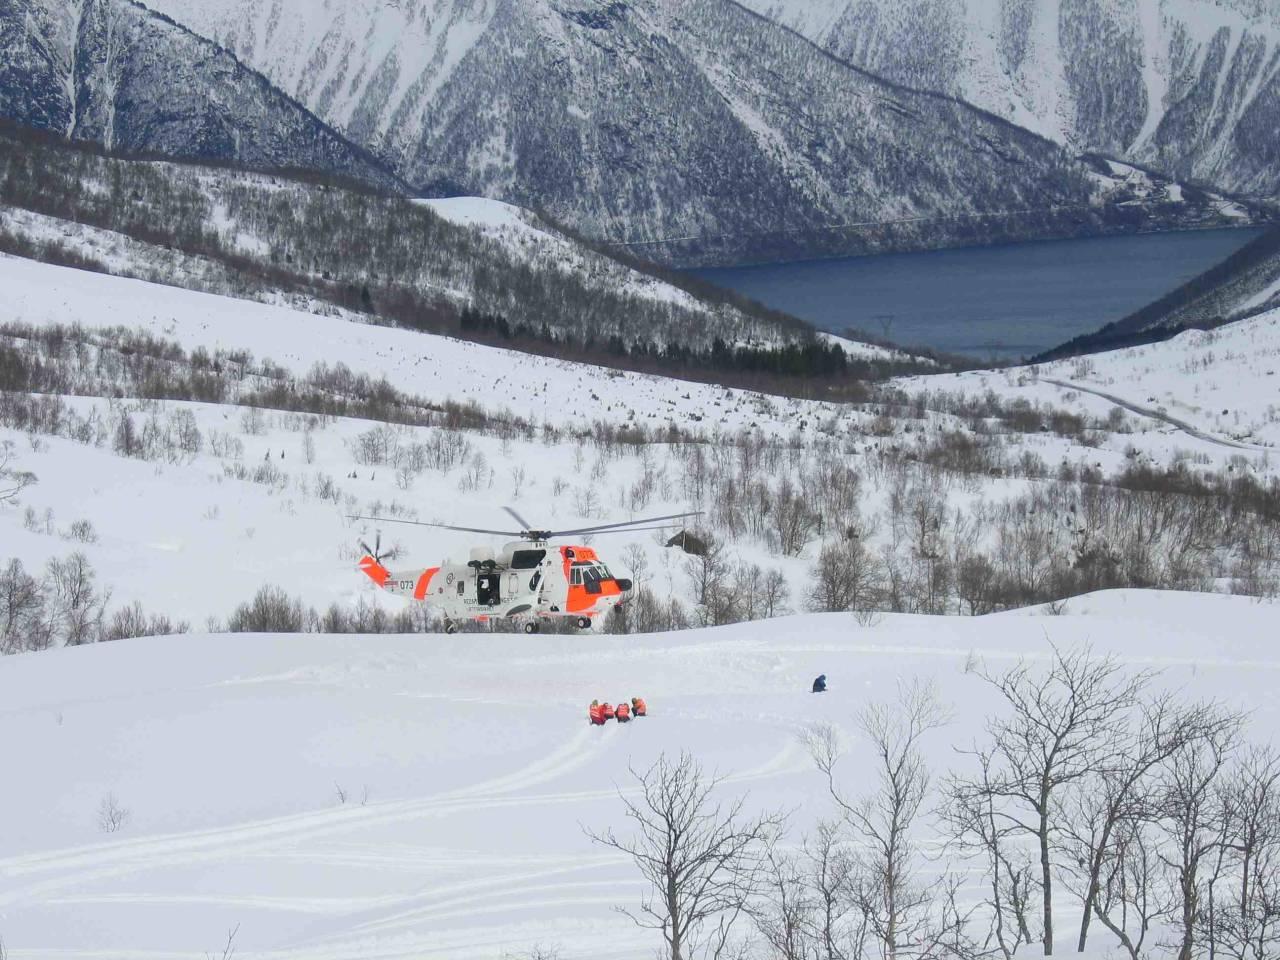 FORBEREDT PÅ DET VERSTE: Røde Kors og Sea King på skredøvelse i Sunnmørsalpene. Foto: Jarle S. Bjørndal